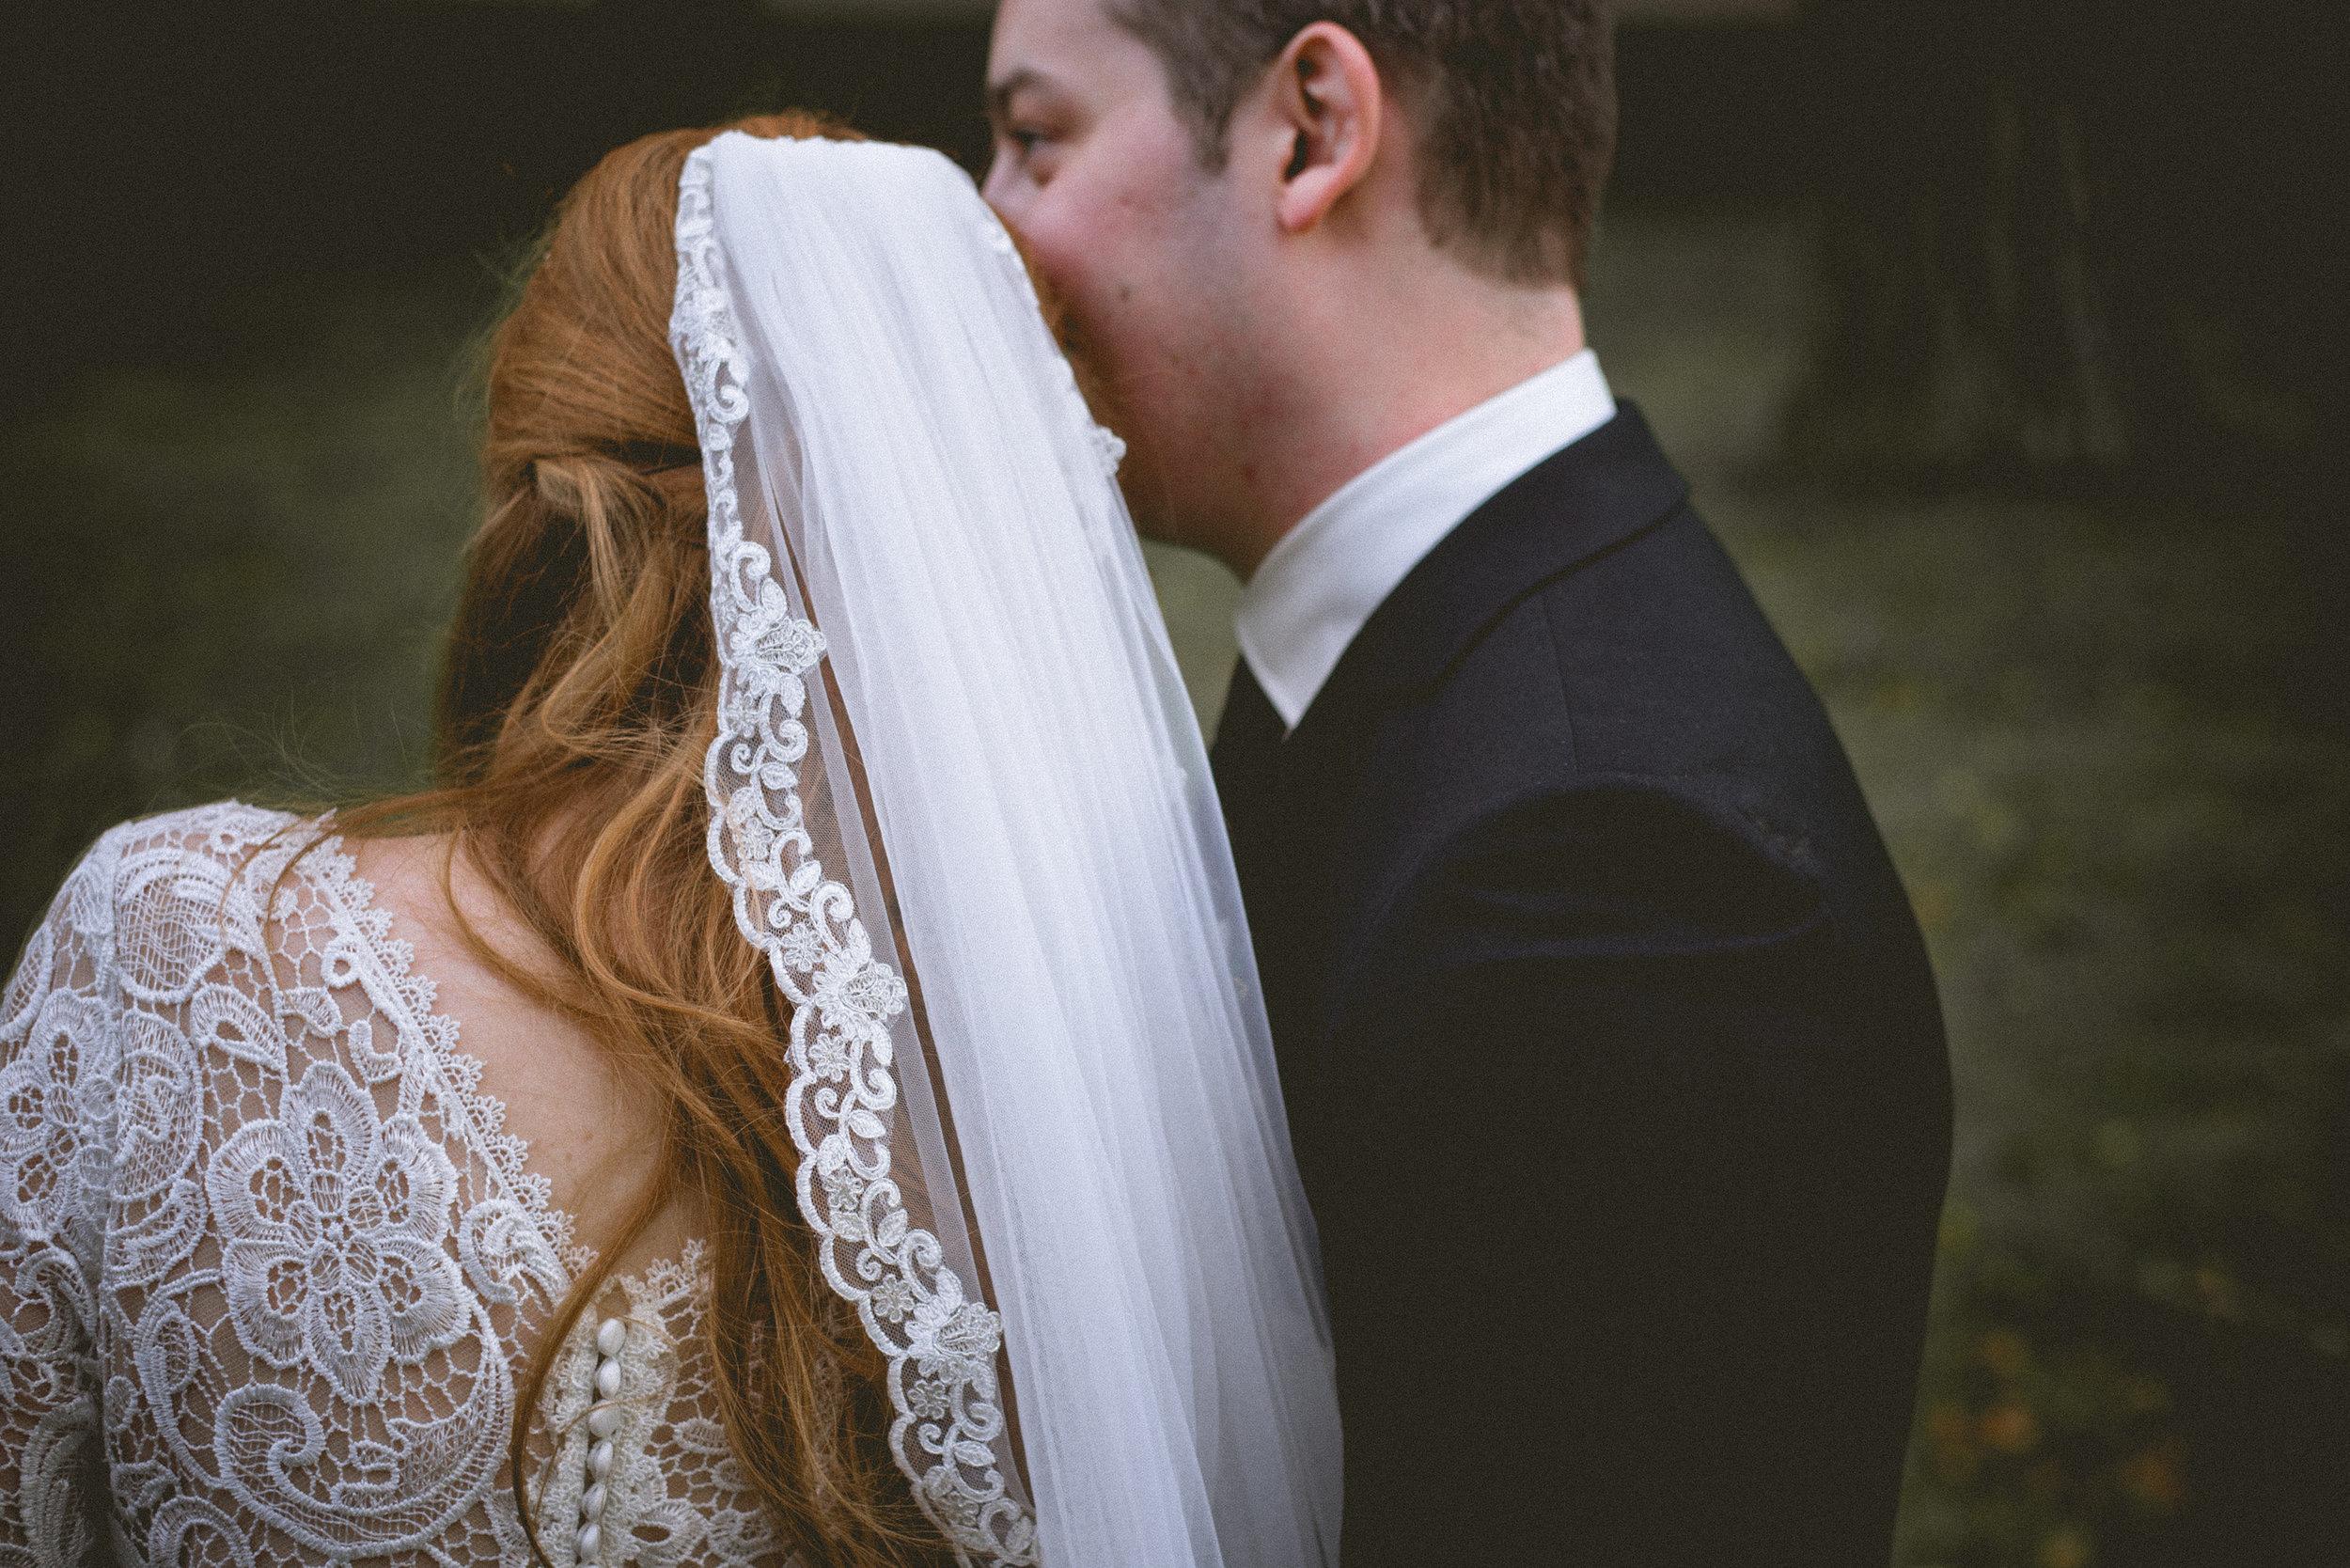 York Region Ontario Wedding Photographer - Bride + Groom-34.jpg